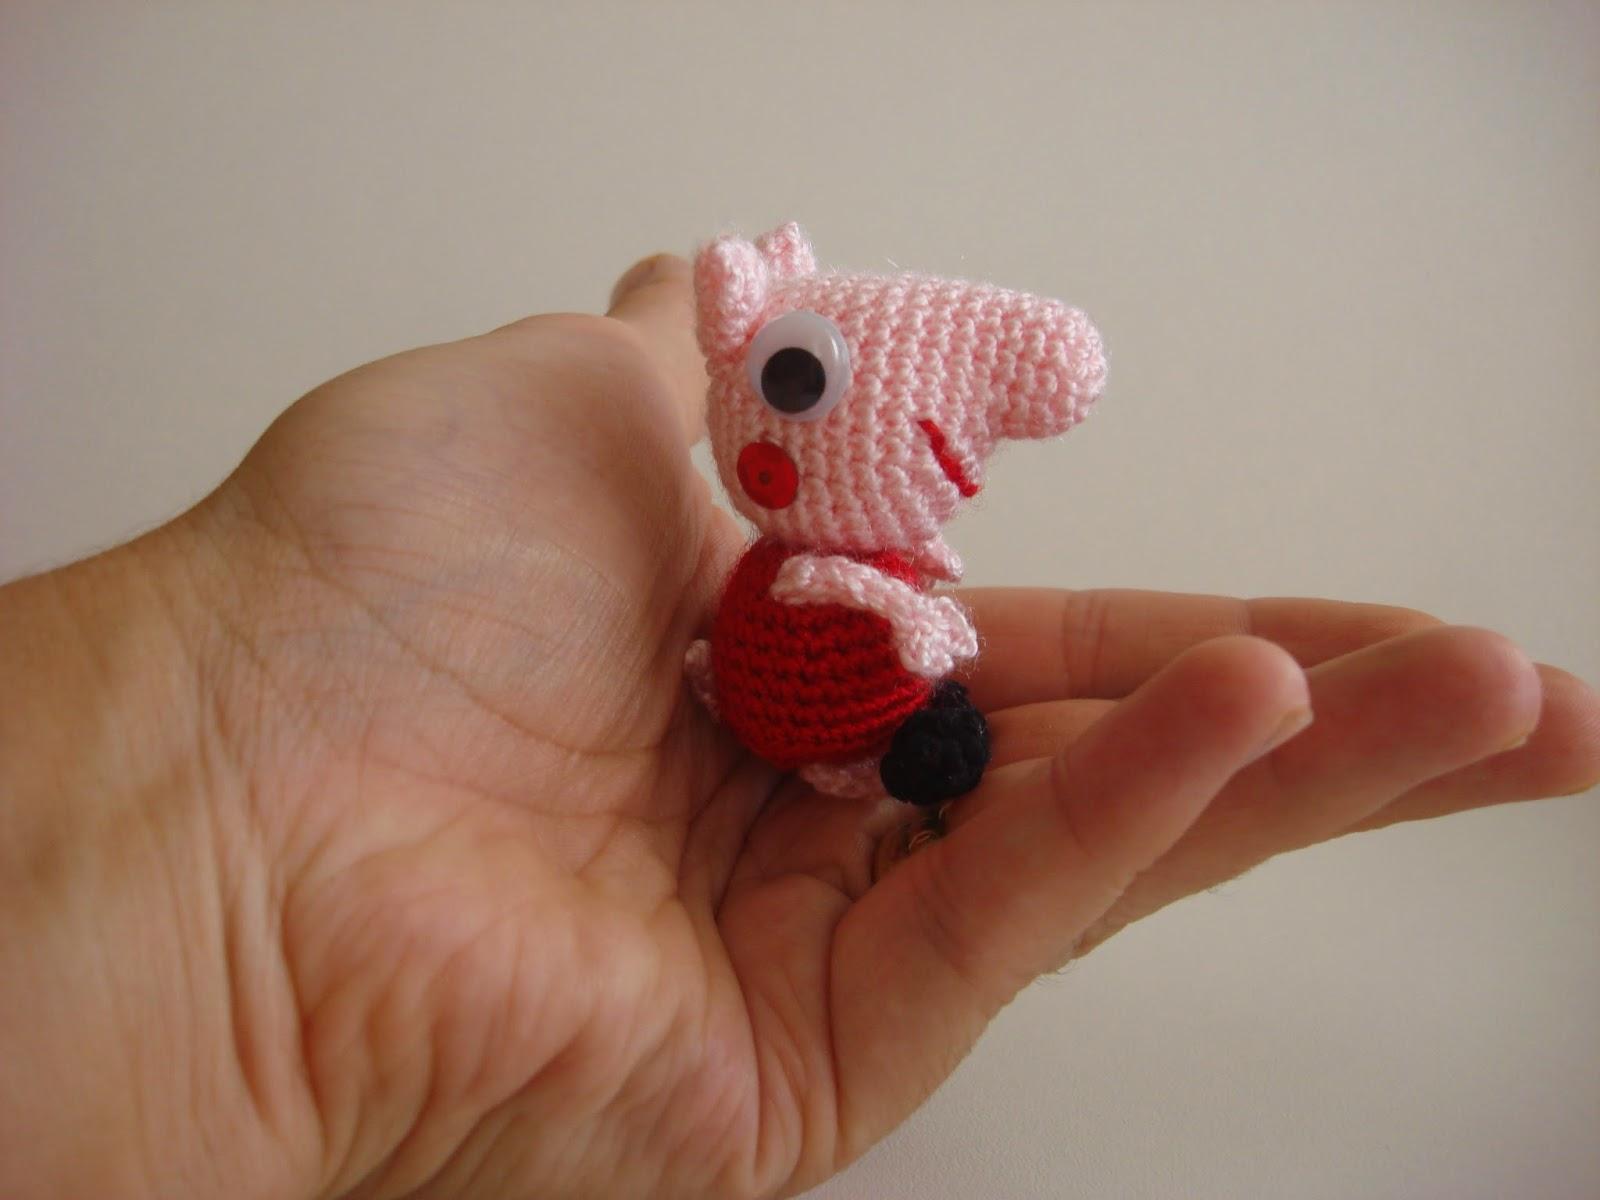 Amigurumi Peppa Pig Mini : CANAL CROCHET: MINI PEPPA PIG AMIGURUMI, PATR?N LIBRE